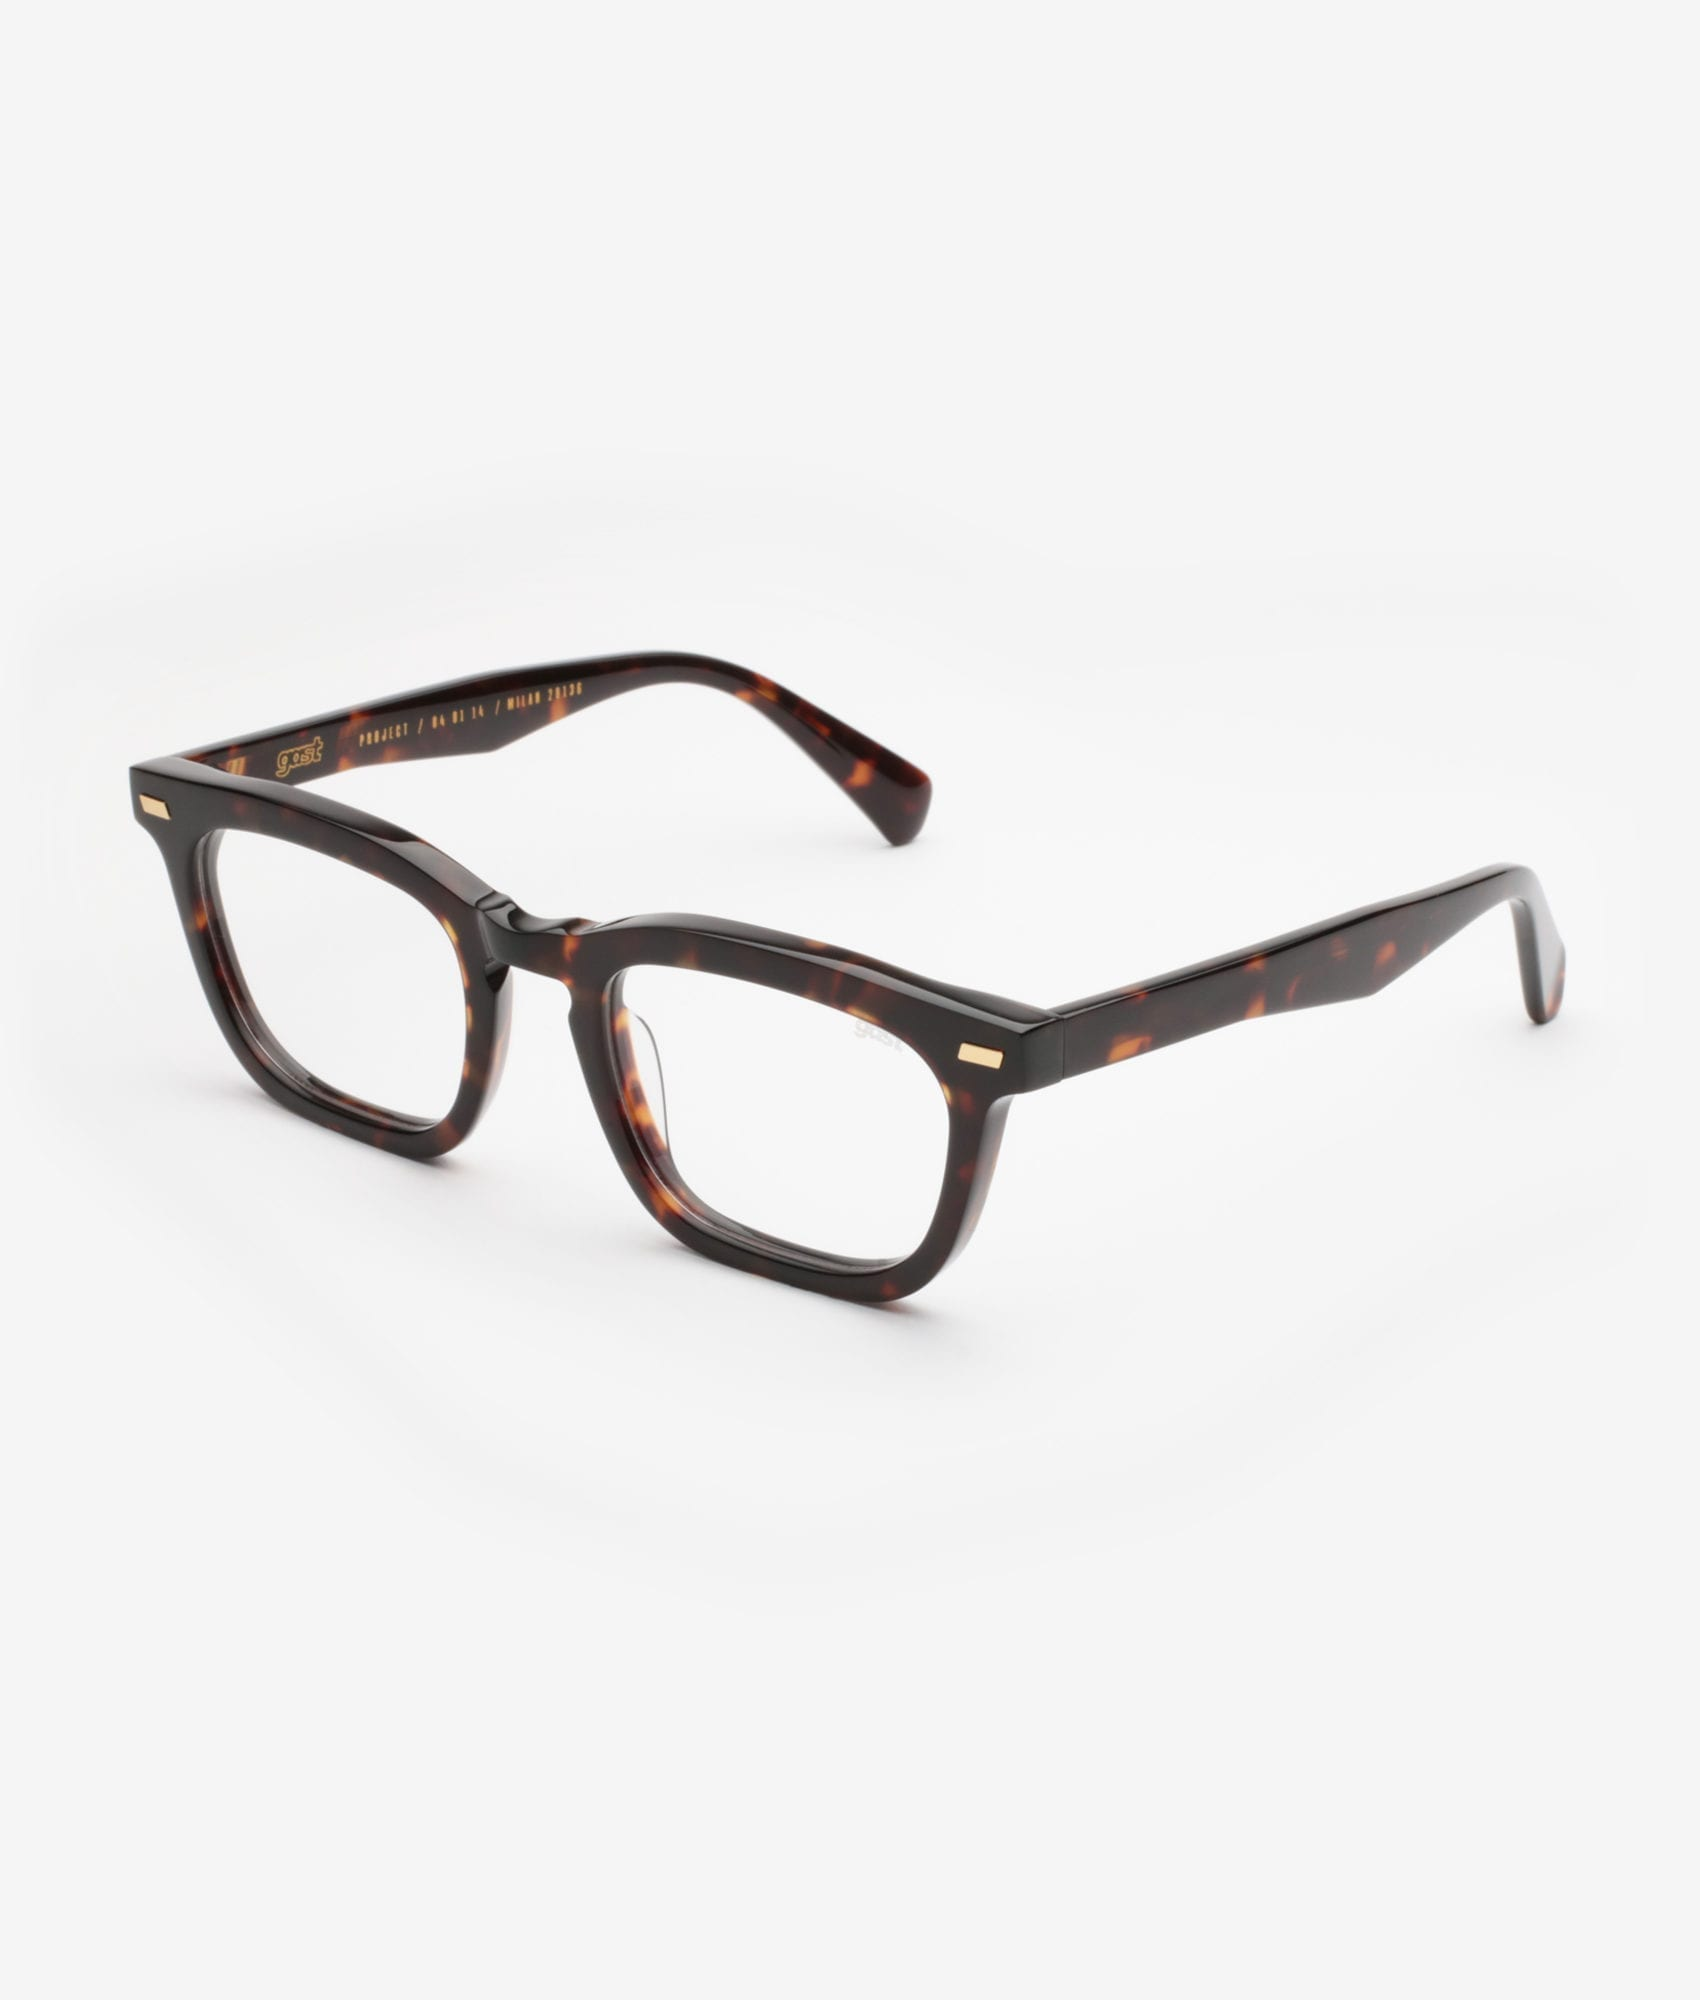 Adre Havana Gast eyewear